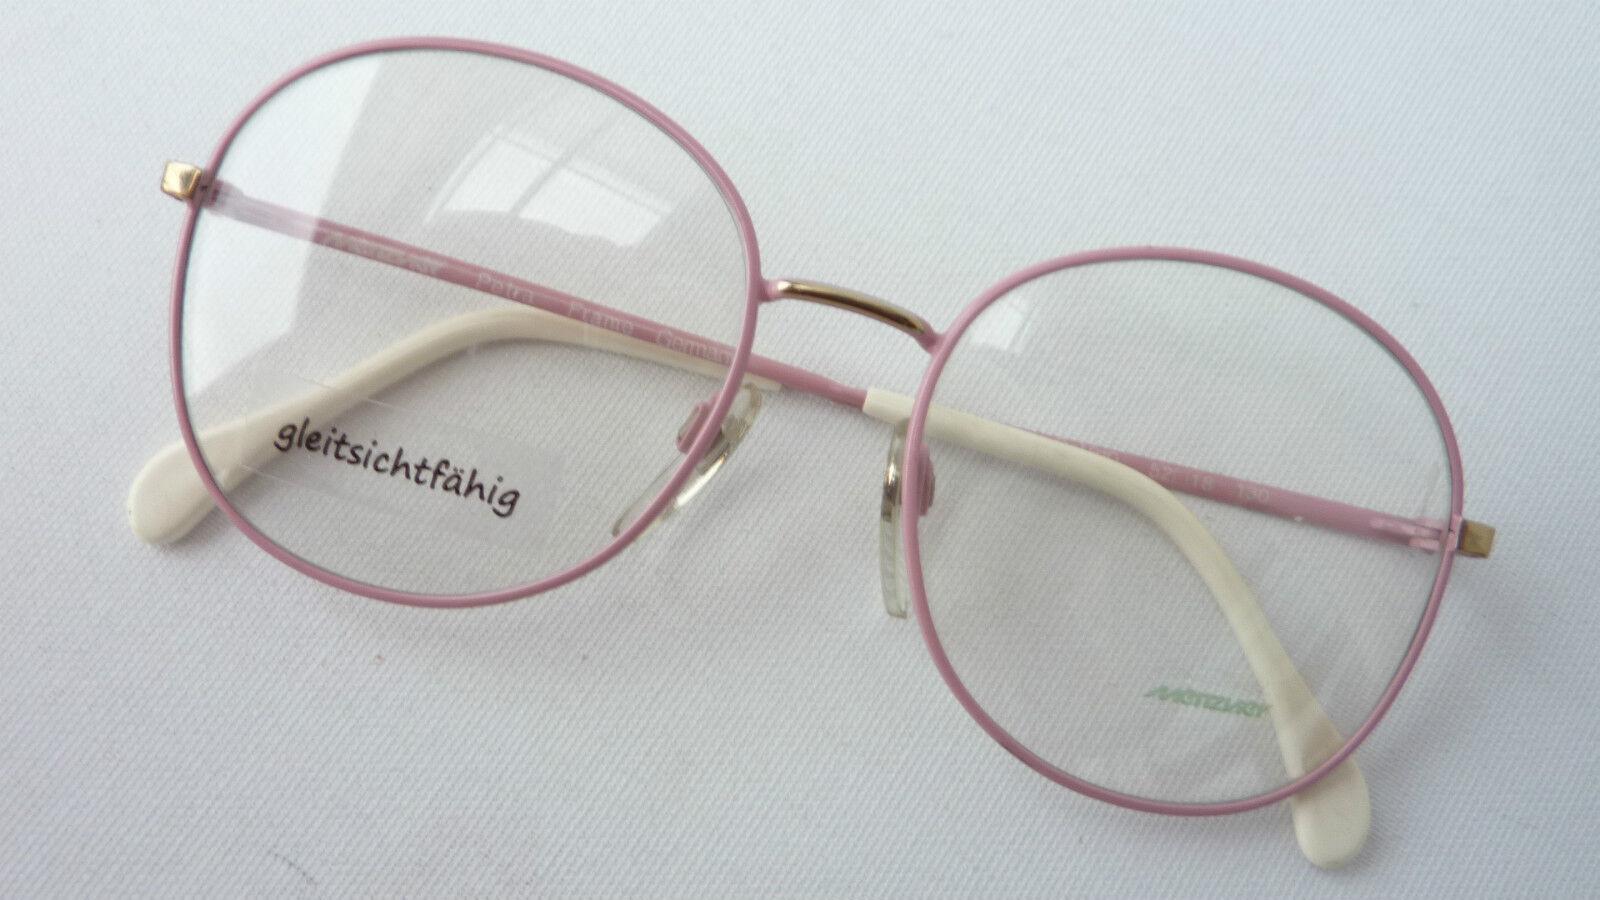 Meitzner Kult- Brille Rosa groß rundliche Form Form Form 70er Vintagebrillen Gr. S 5218   Große Ausverkauf    Flagship-Store    Günstige Preise  b85e27